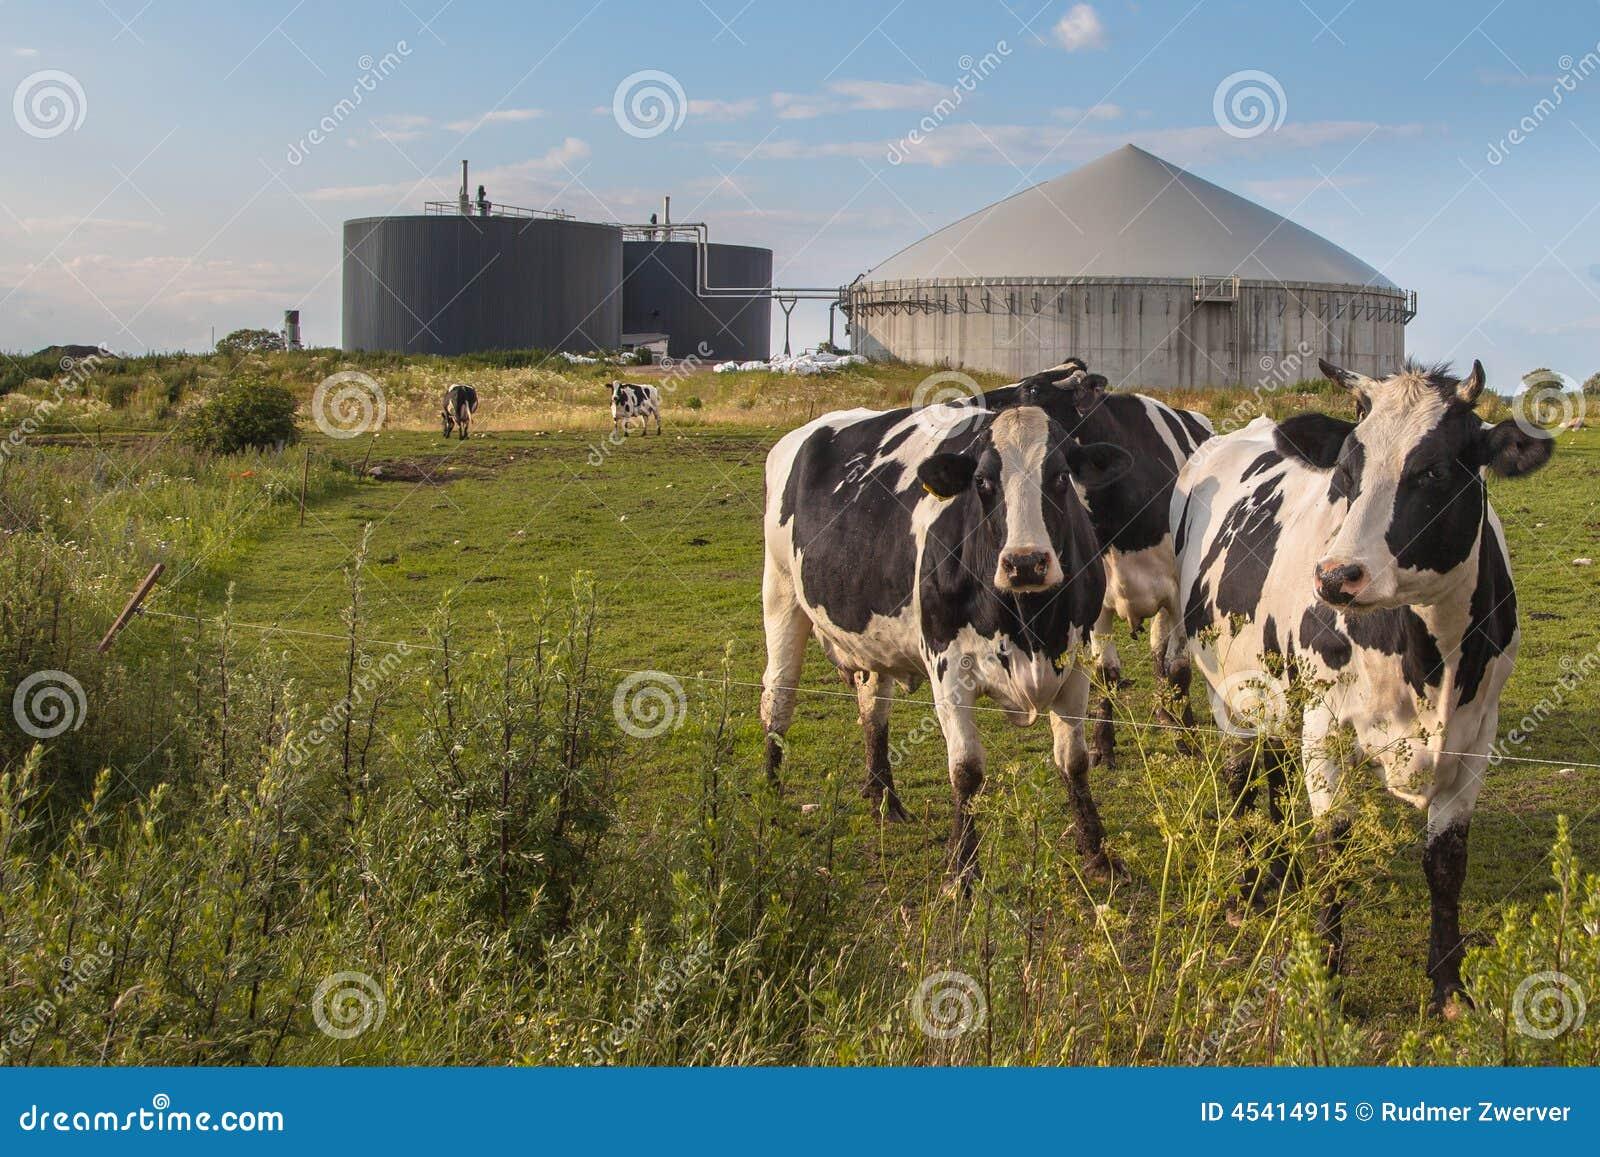 biogas cow - photo #1